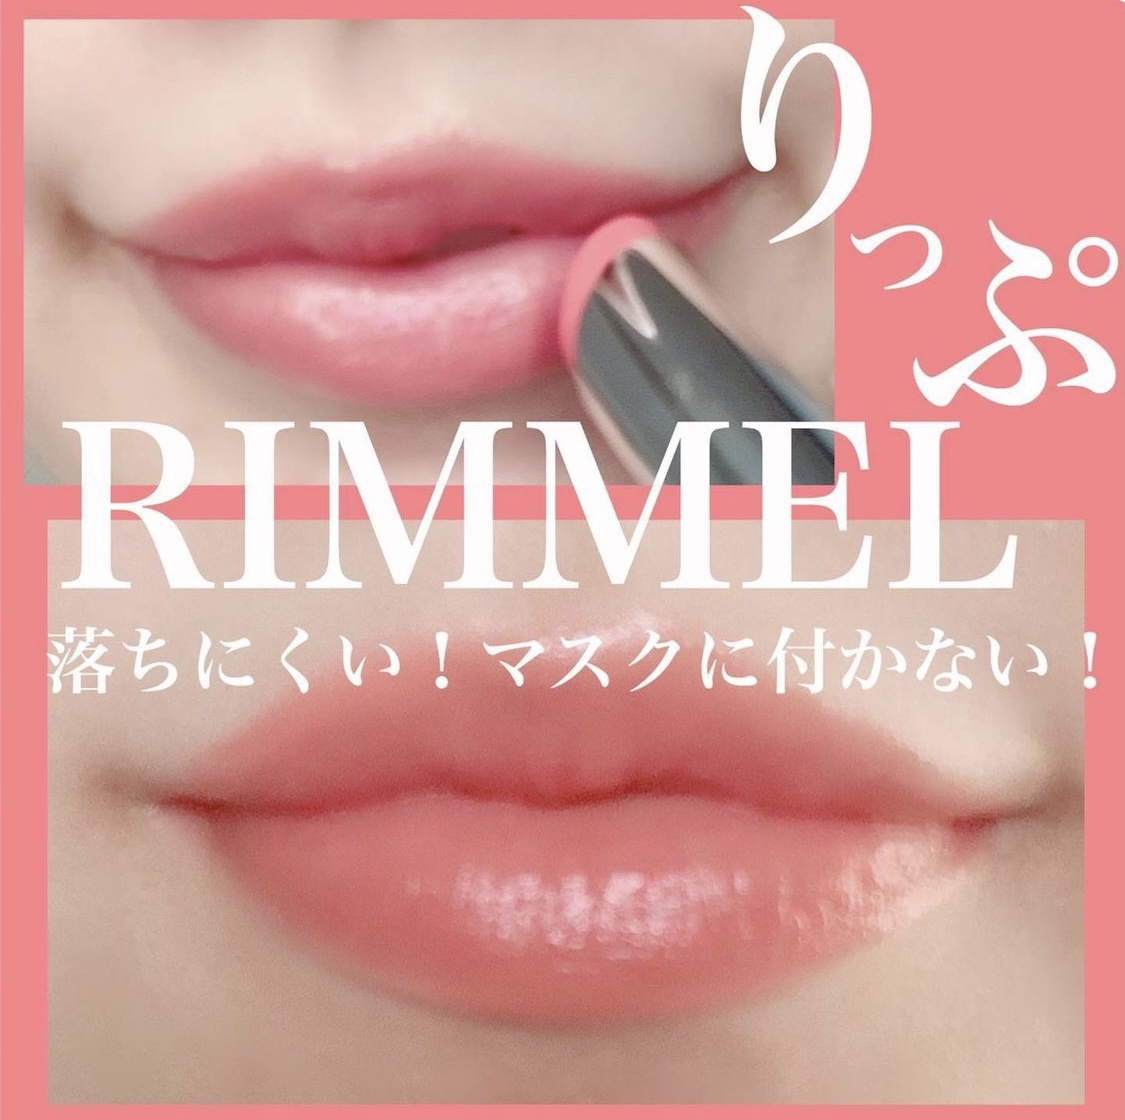 RIMMEL(リンメル) ラスティングフィニッシュ クリーミィ リップを使ったaikさんのクチコミ画像